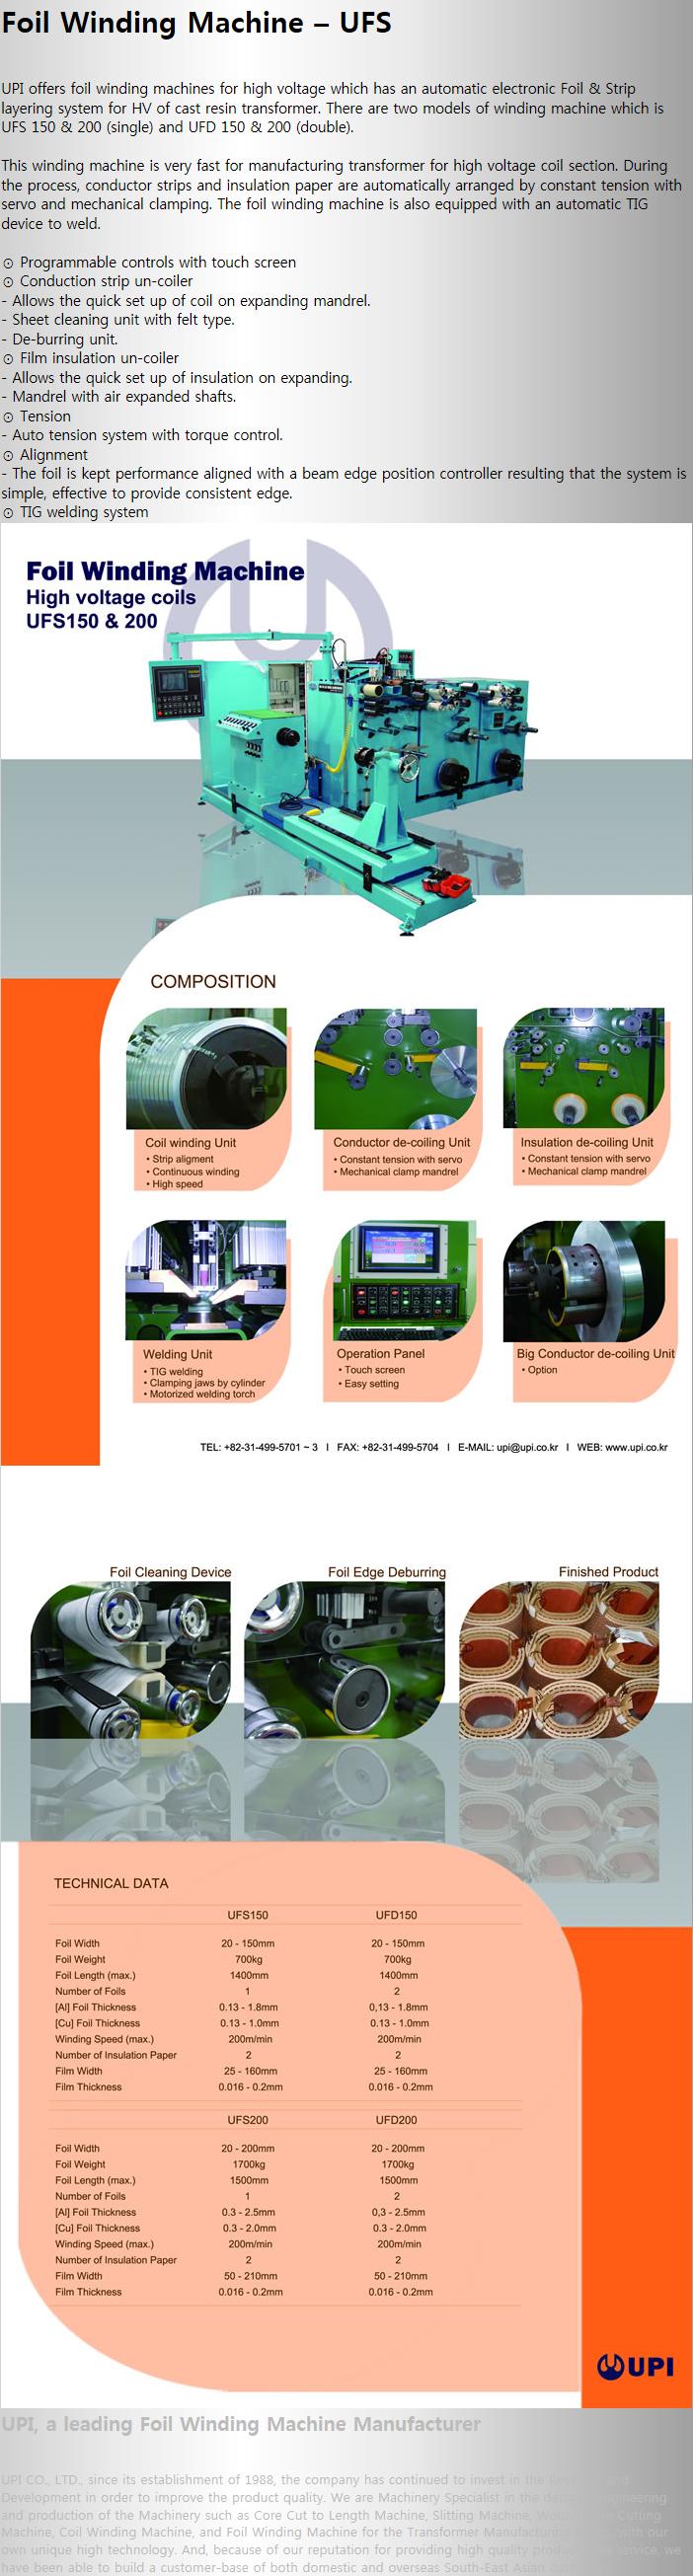 UPI Foil Winding Machine UFS